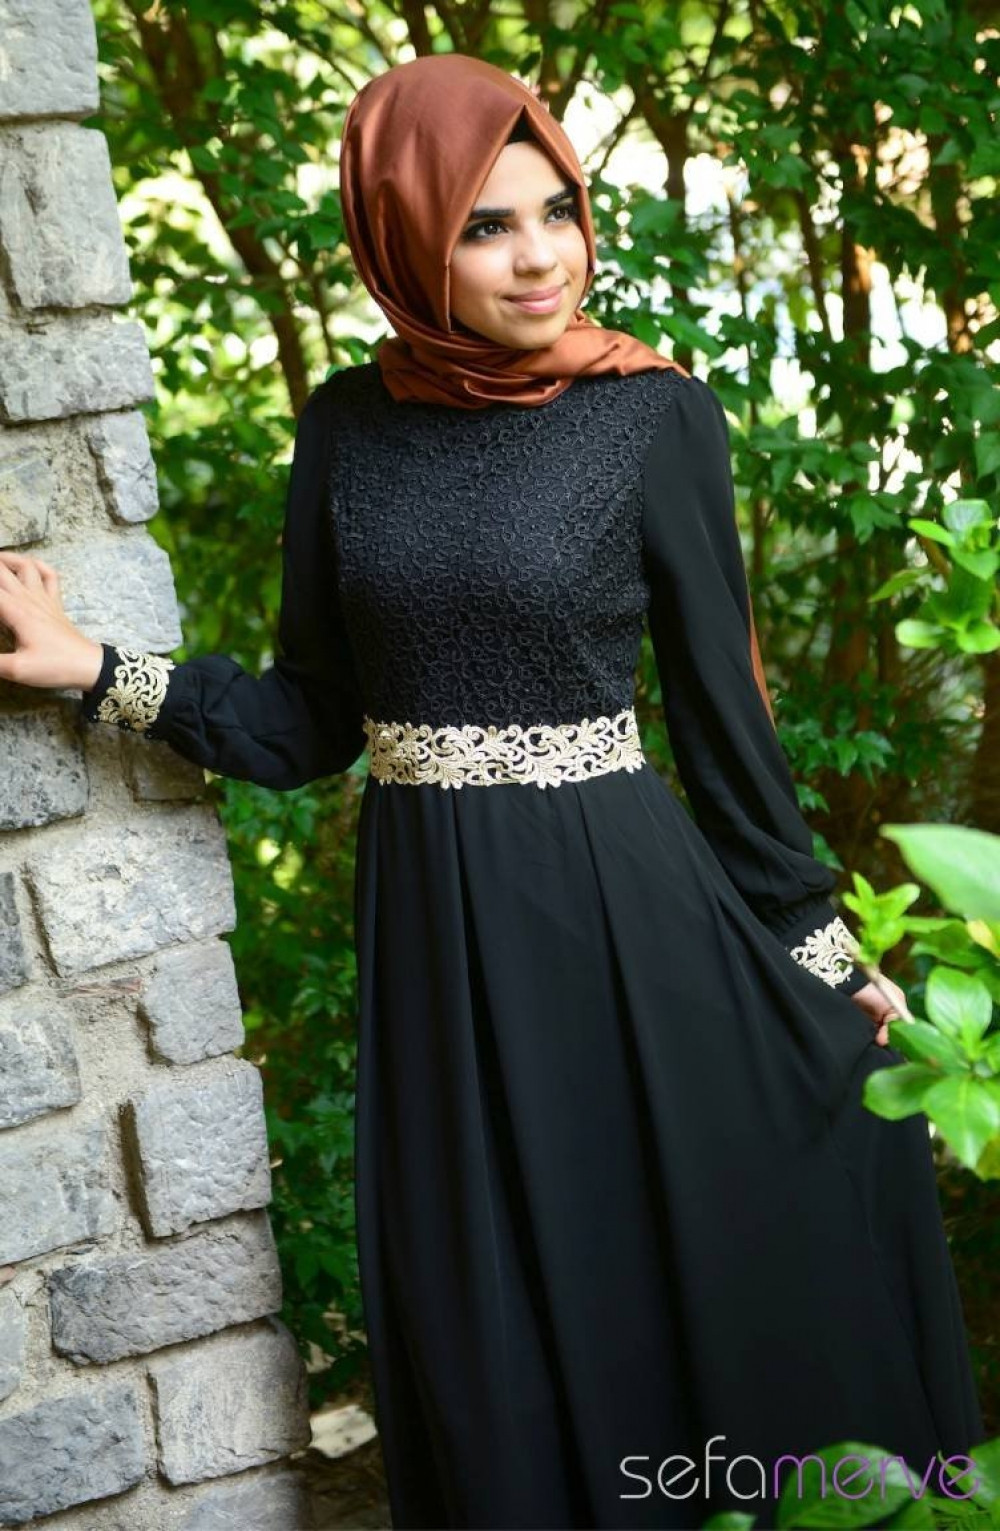 f509f2b20dd45 Sefamerve Siyah Elbise | Ehl-i Tesettür